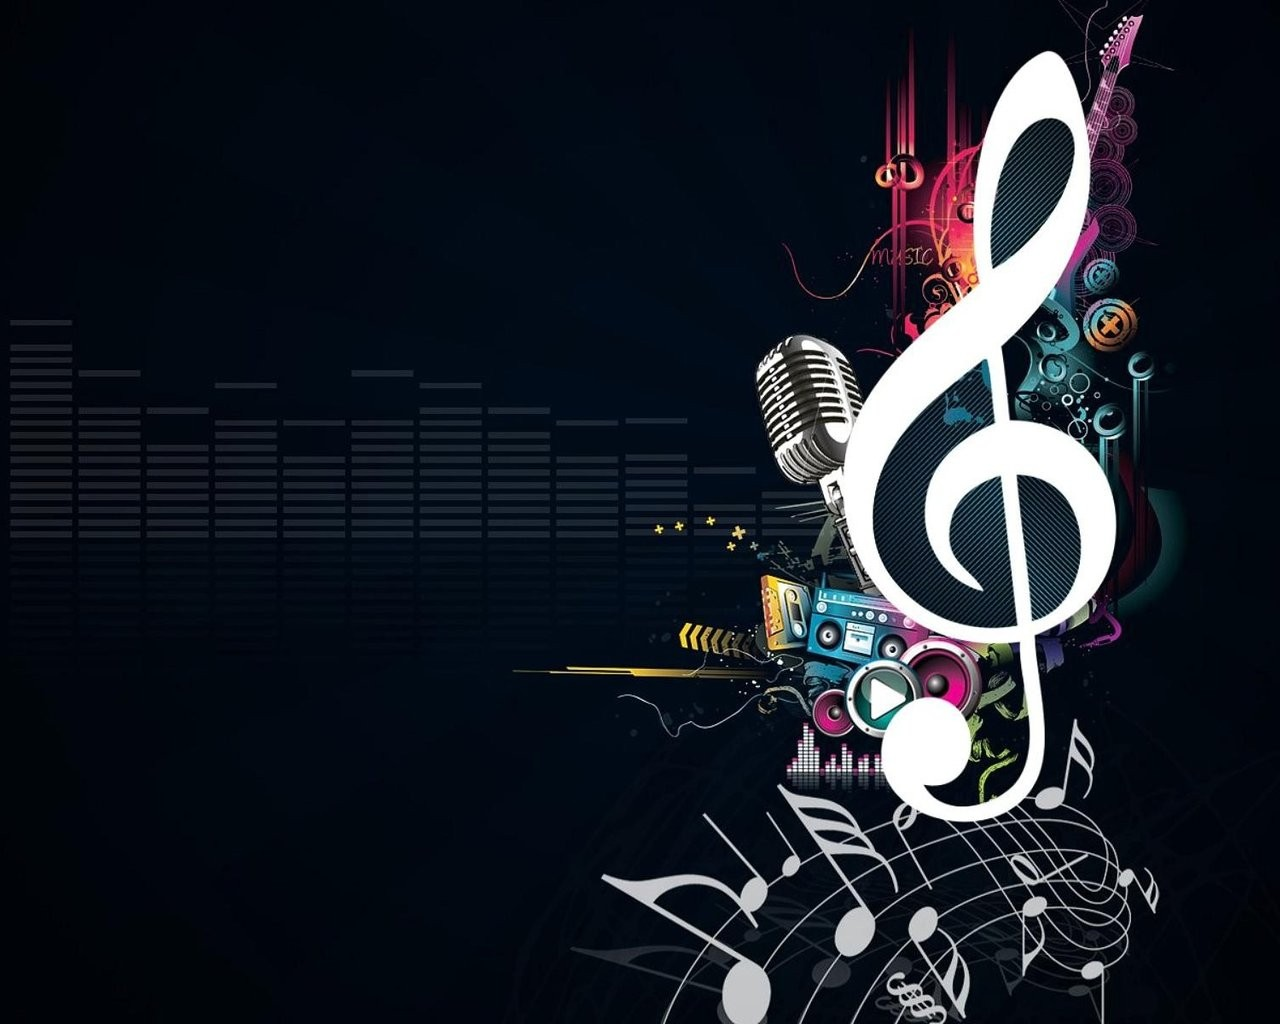 [76+] Cool Music Background Wallpapers On WallpaperSafari